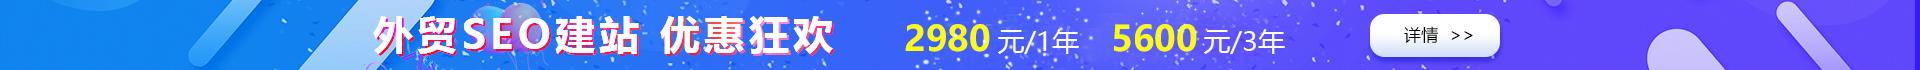 86001